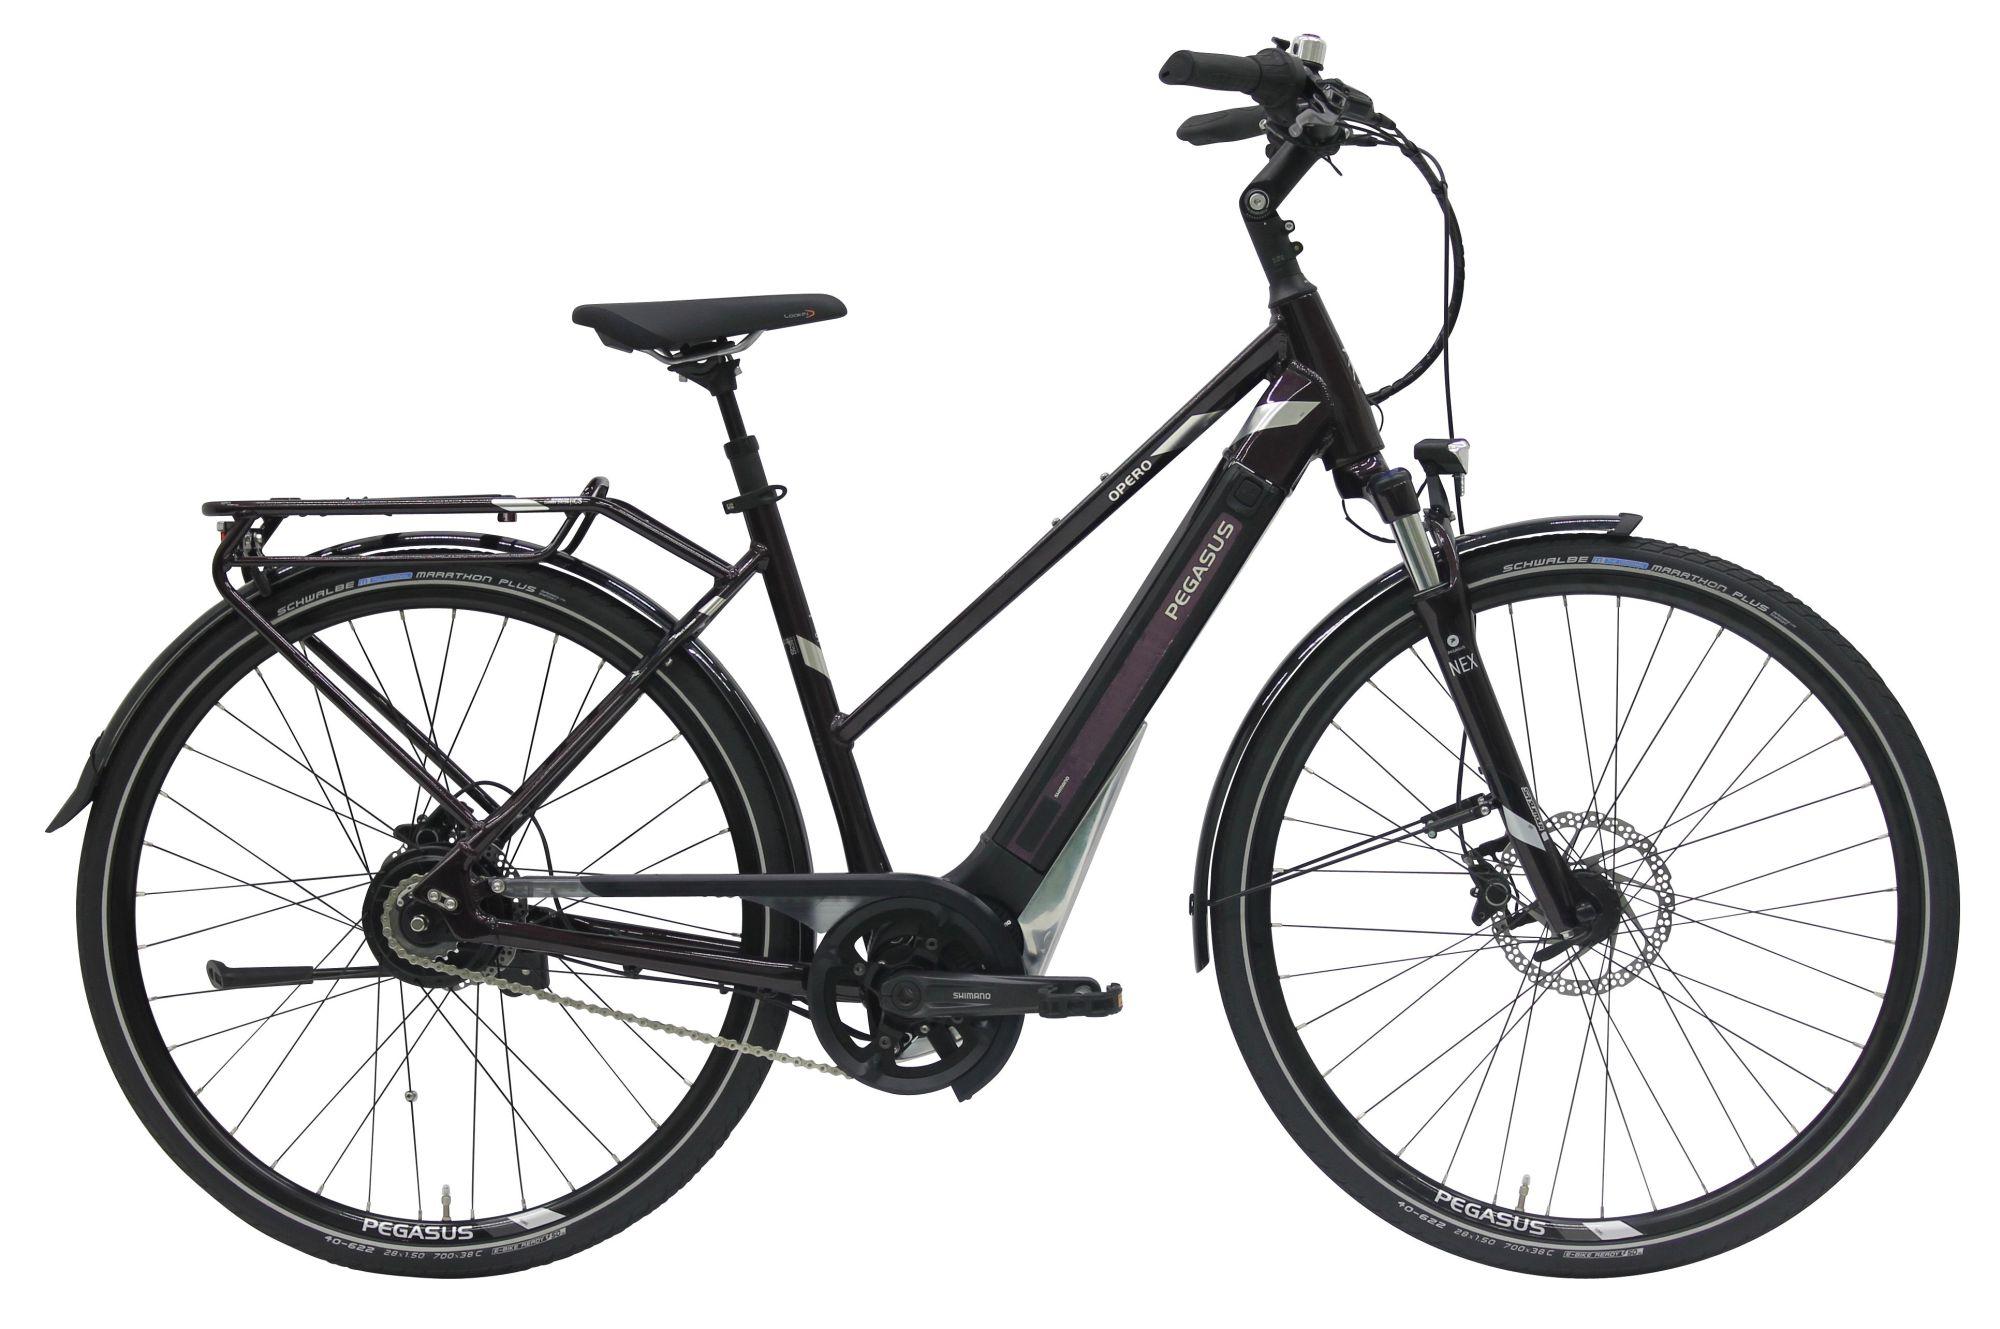 E-Bikes/Citybikes: Pegasus  Opero EVO NuE (375 Wh) 1 Gang stufenlose Nabenschaltung Damenfahrrad Trapez Modell 2018 28 Zoll 53 cm